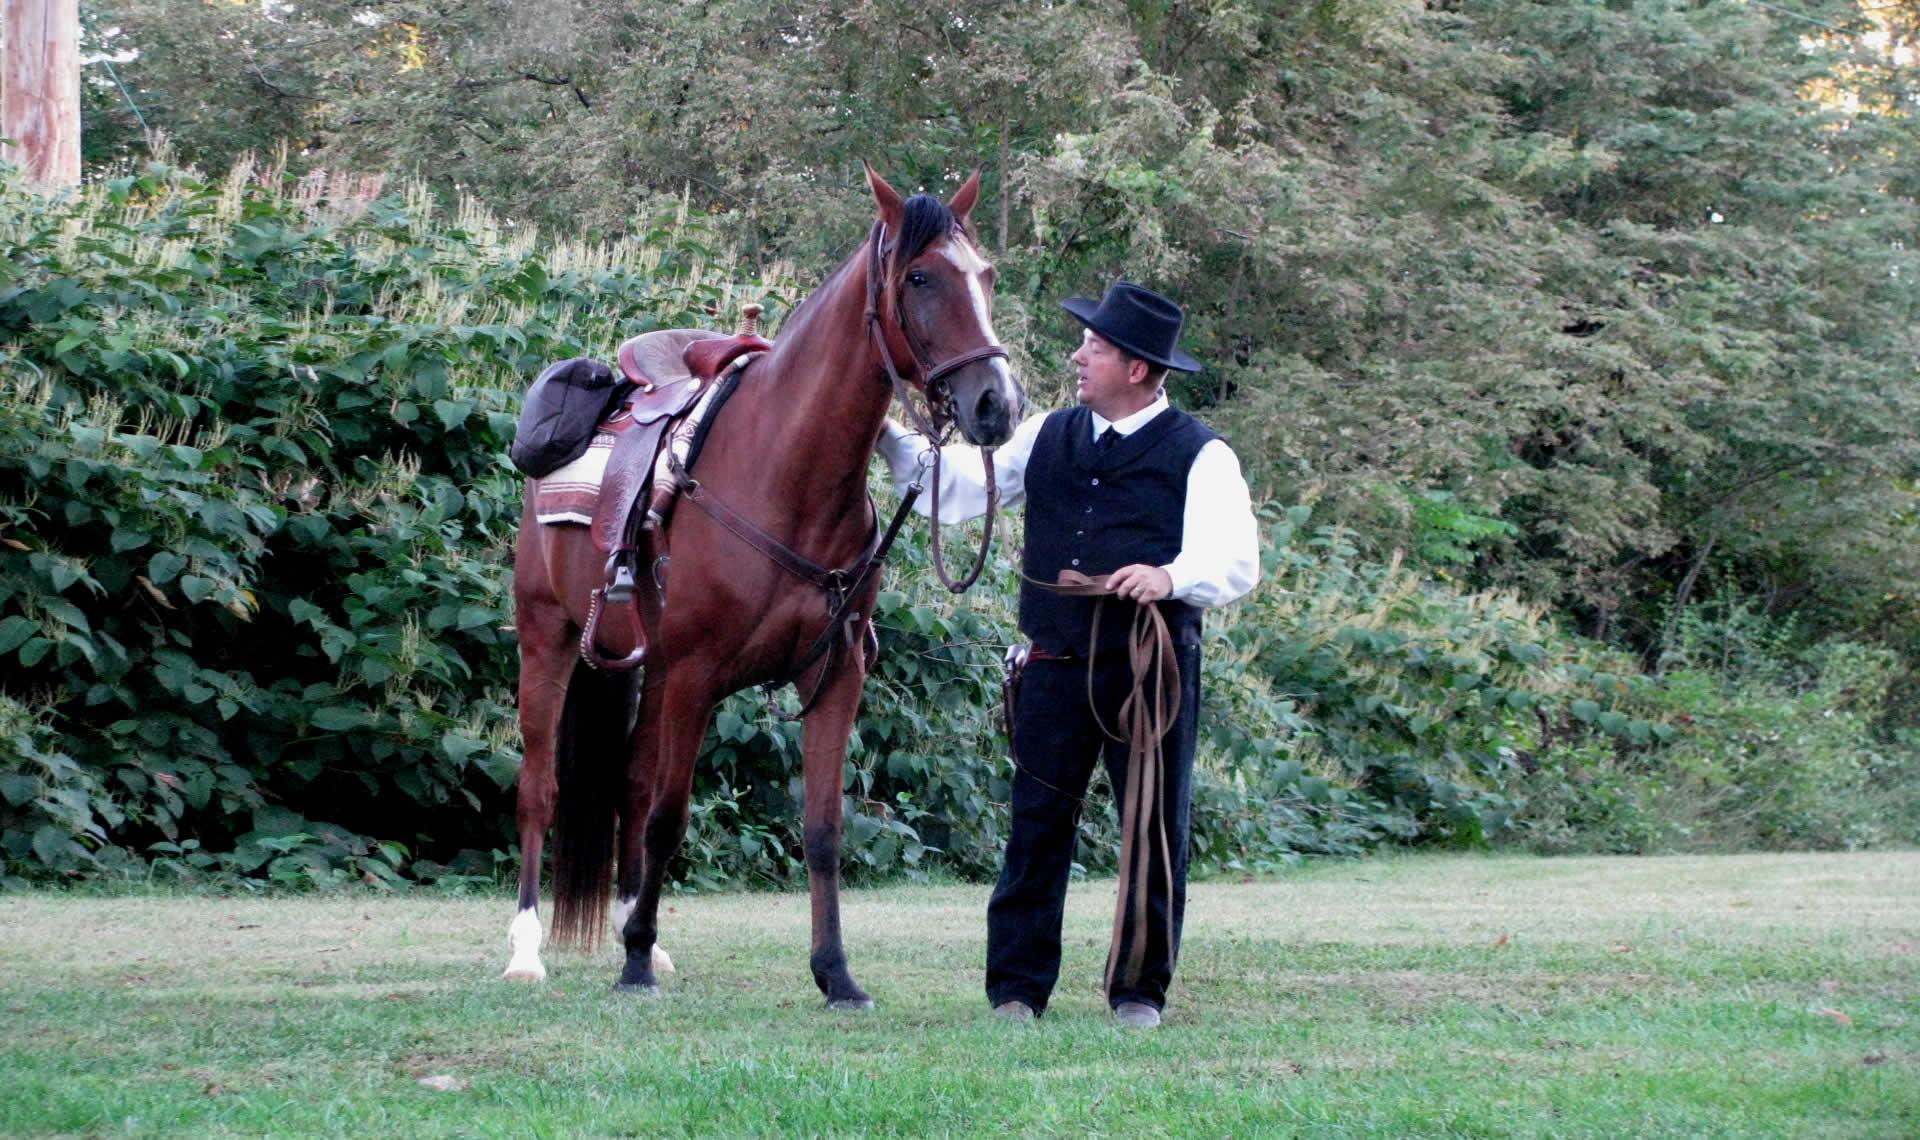 preacher with horse